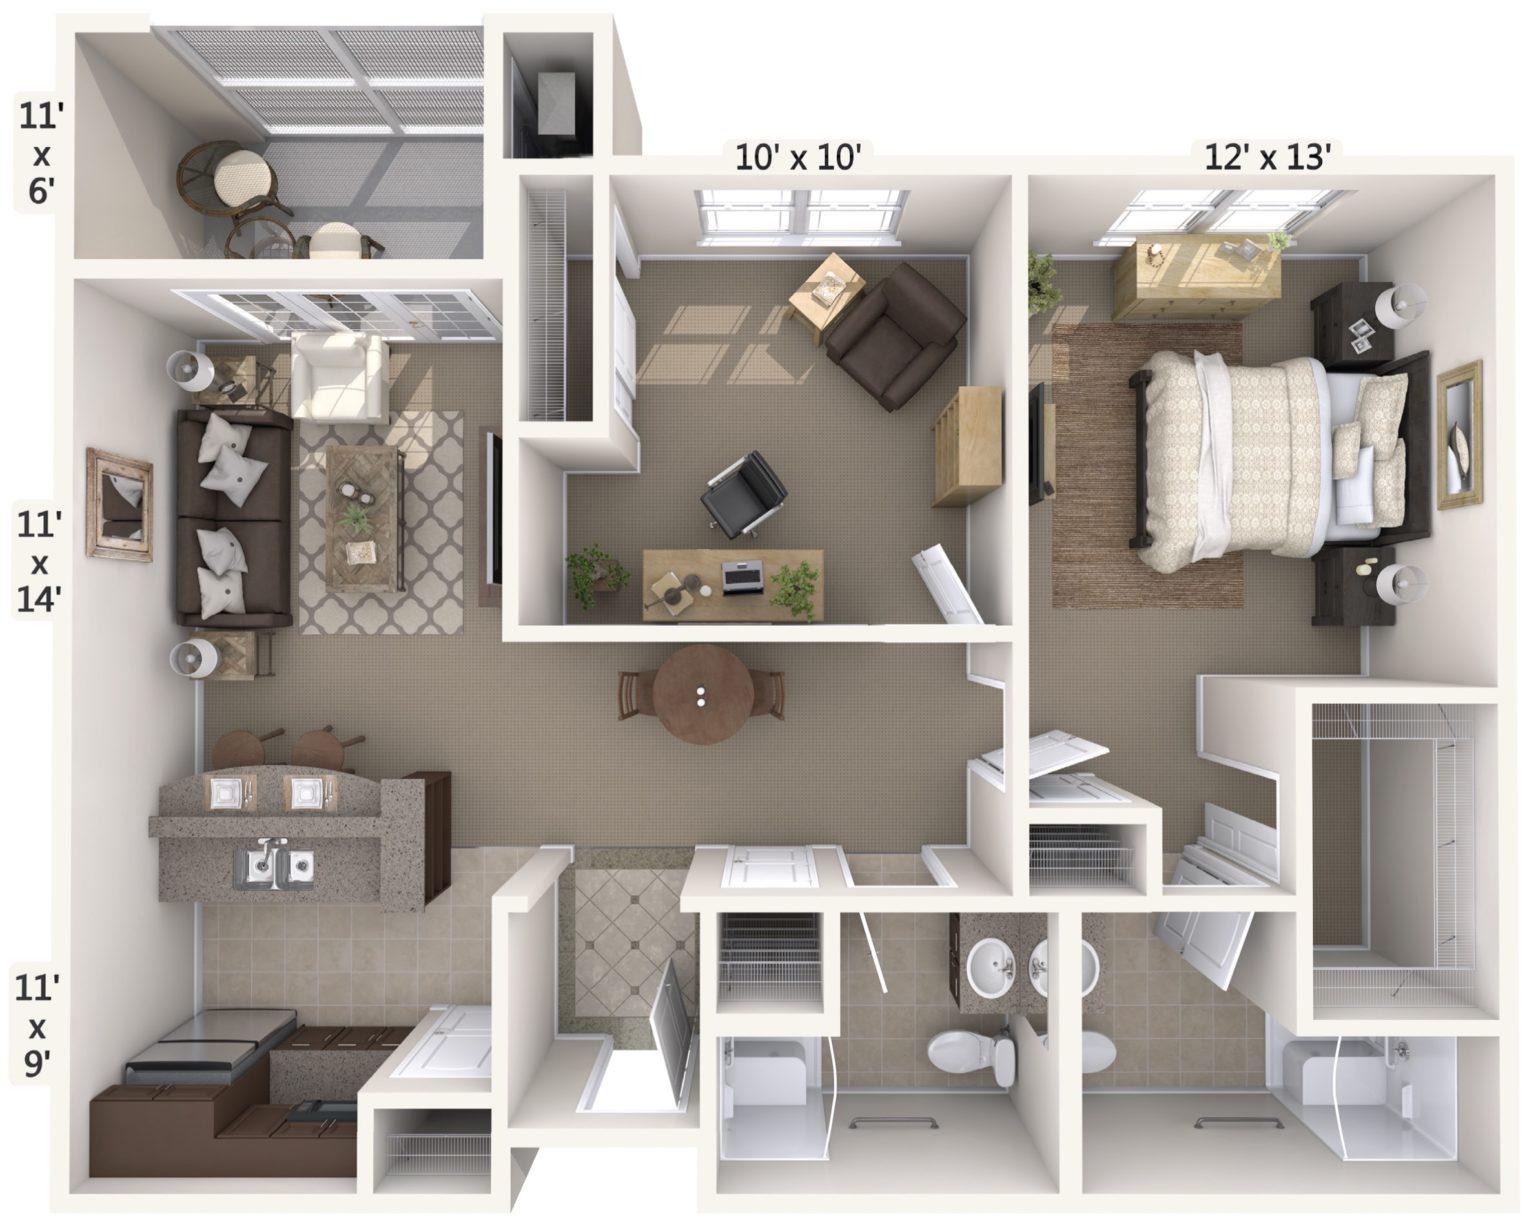 AddingtonPlace_One-Bedroom-with-Den-Crescendo_1024-sq.-ft._AL_Stuart-1536x1227